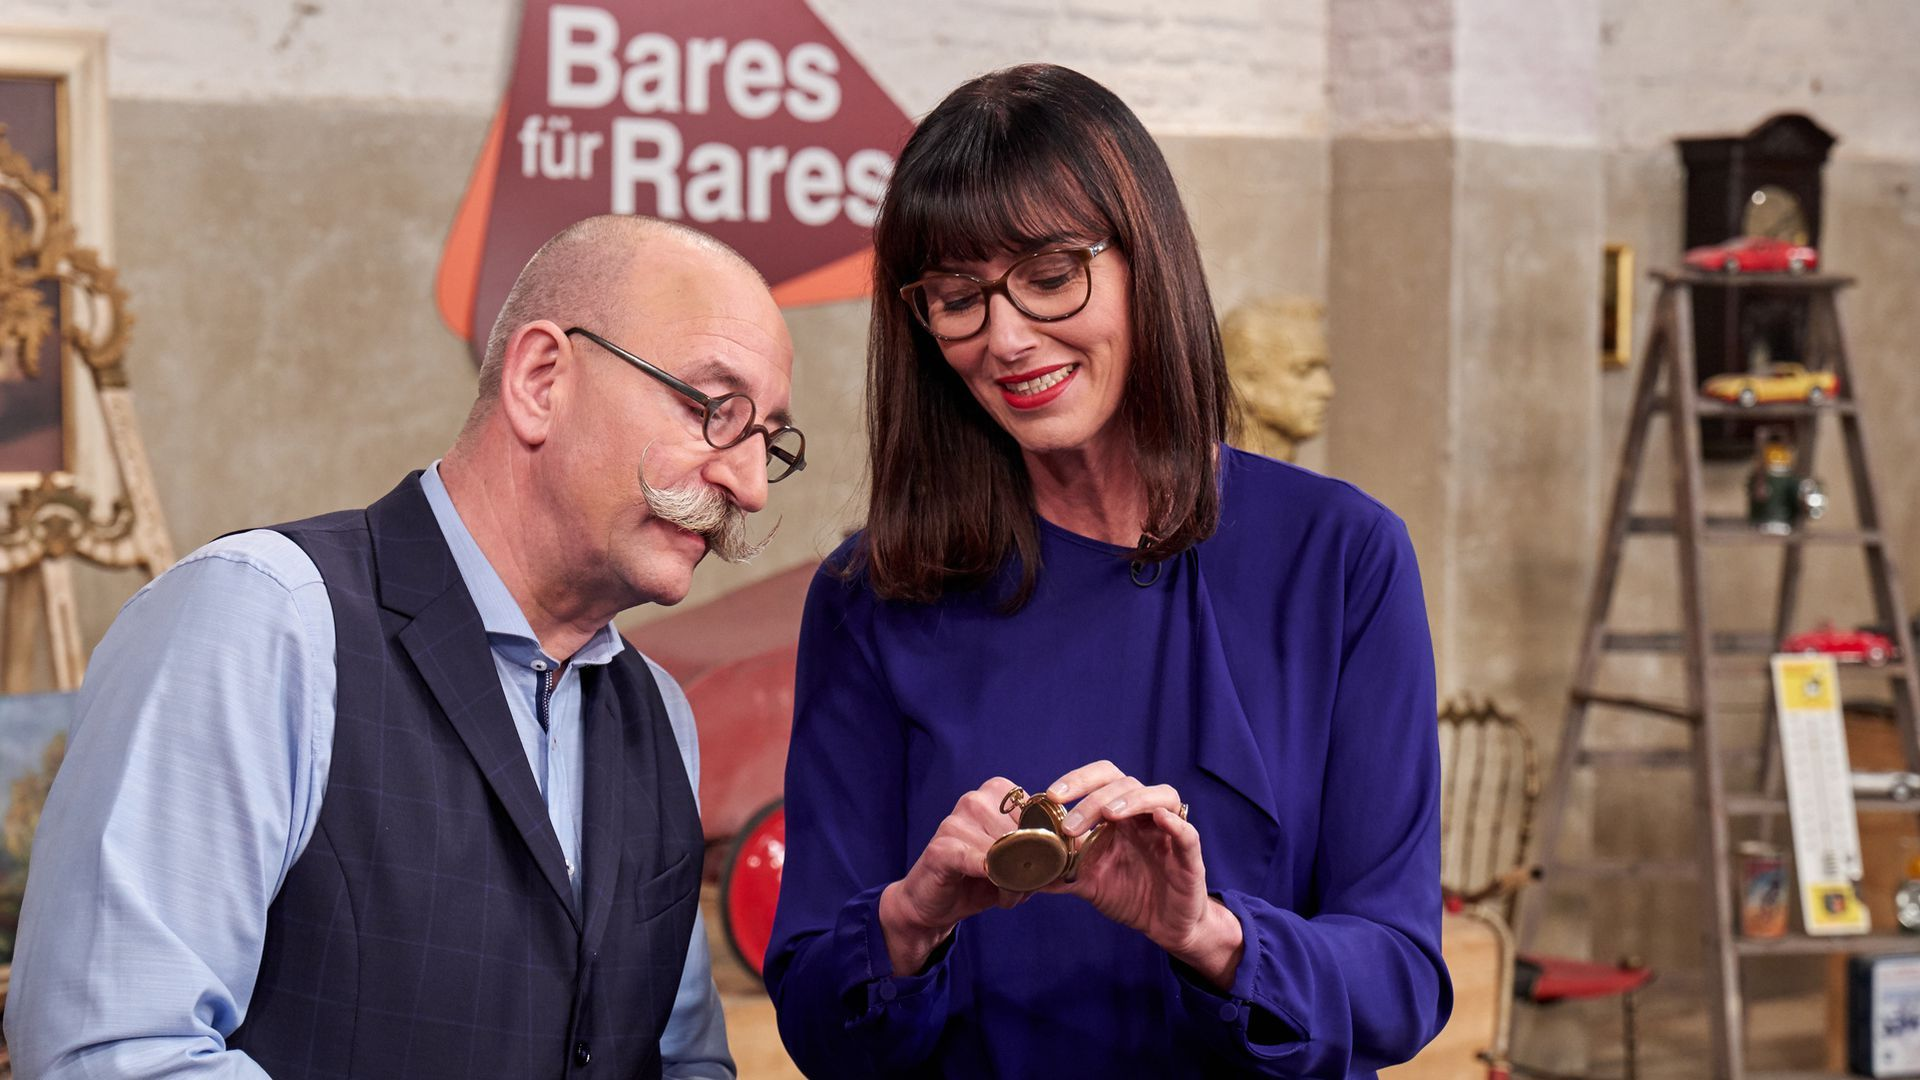 Absolutes Schatzchen Bares Fur Rares Expertin Hin Weg In 2020 Bares Fur Rares Charlene Von Monaco Teilnehmer